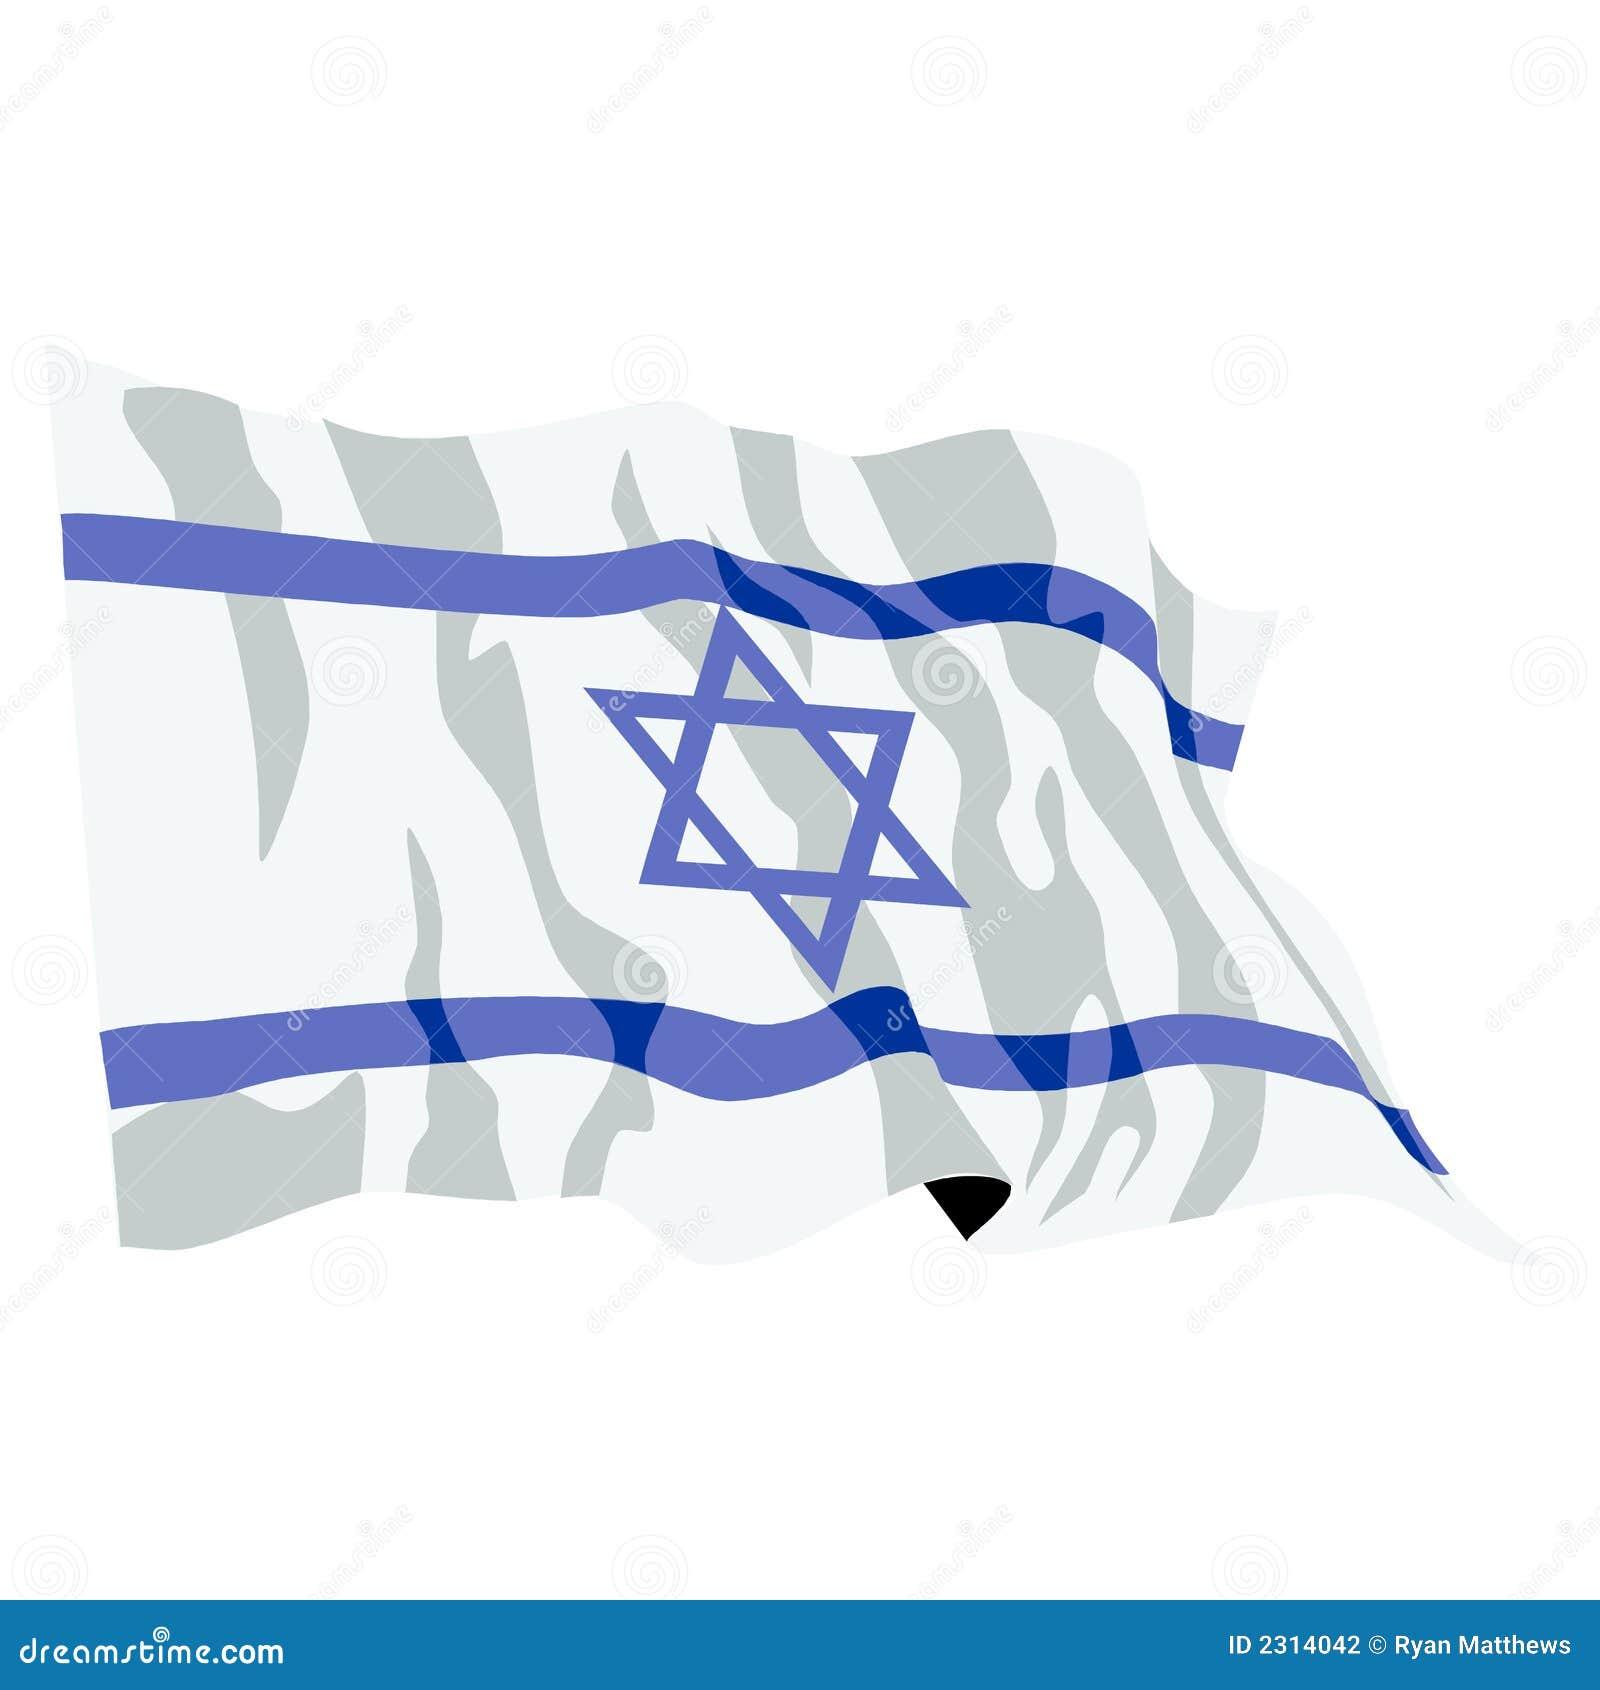 clipart israel flag - photo #24